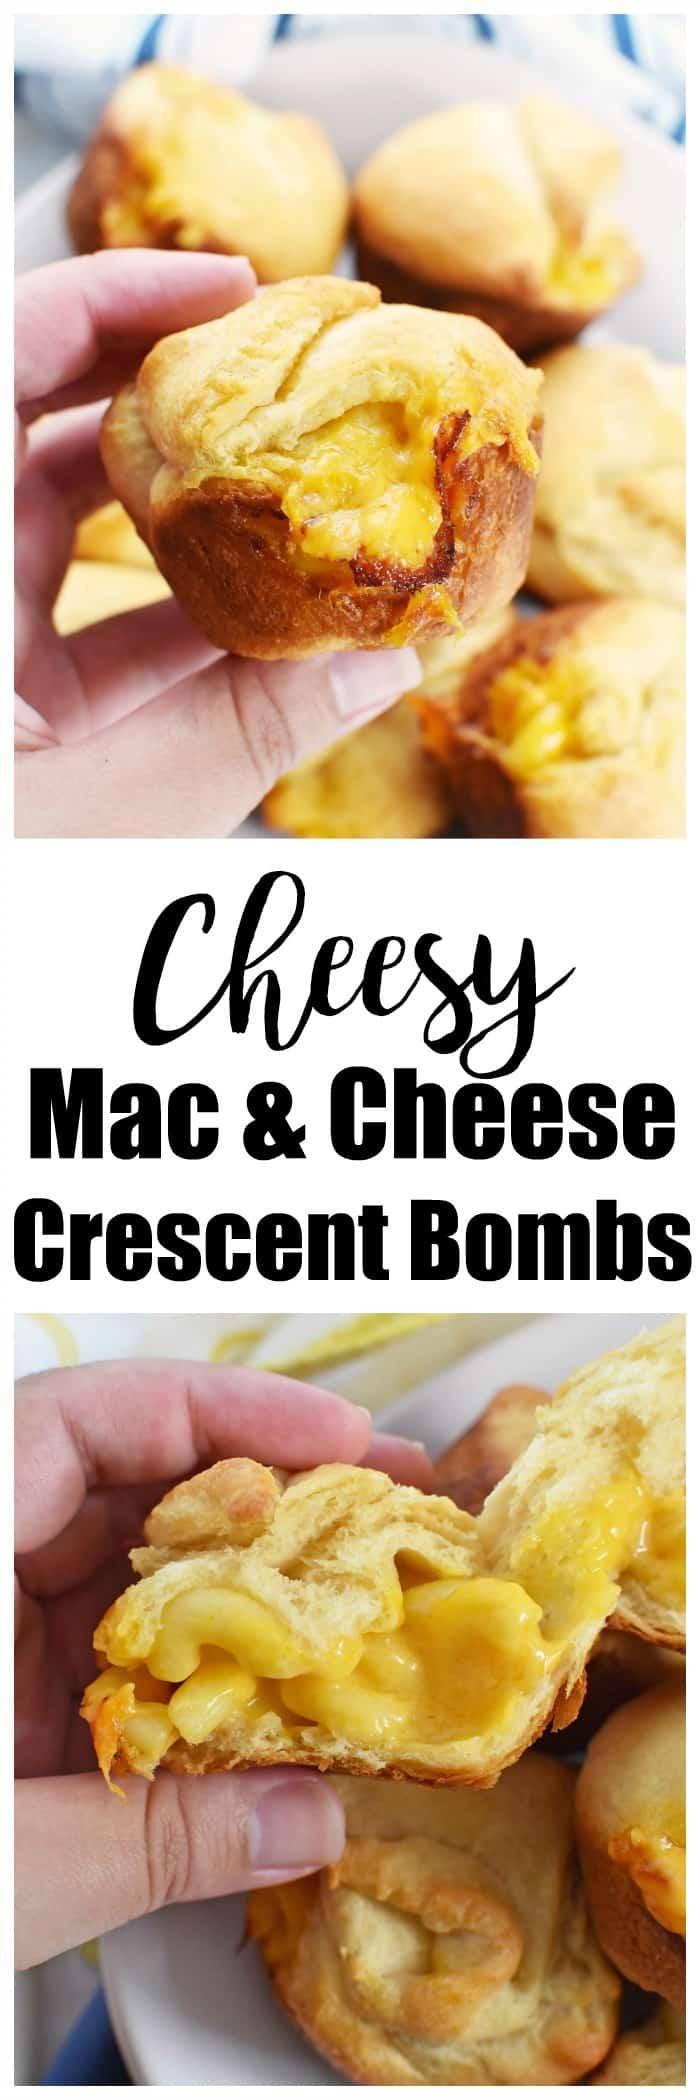 Macaroni & Cheese Crescent Bombs